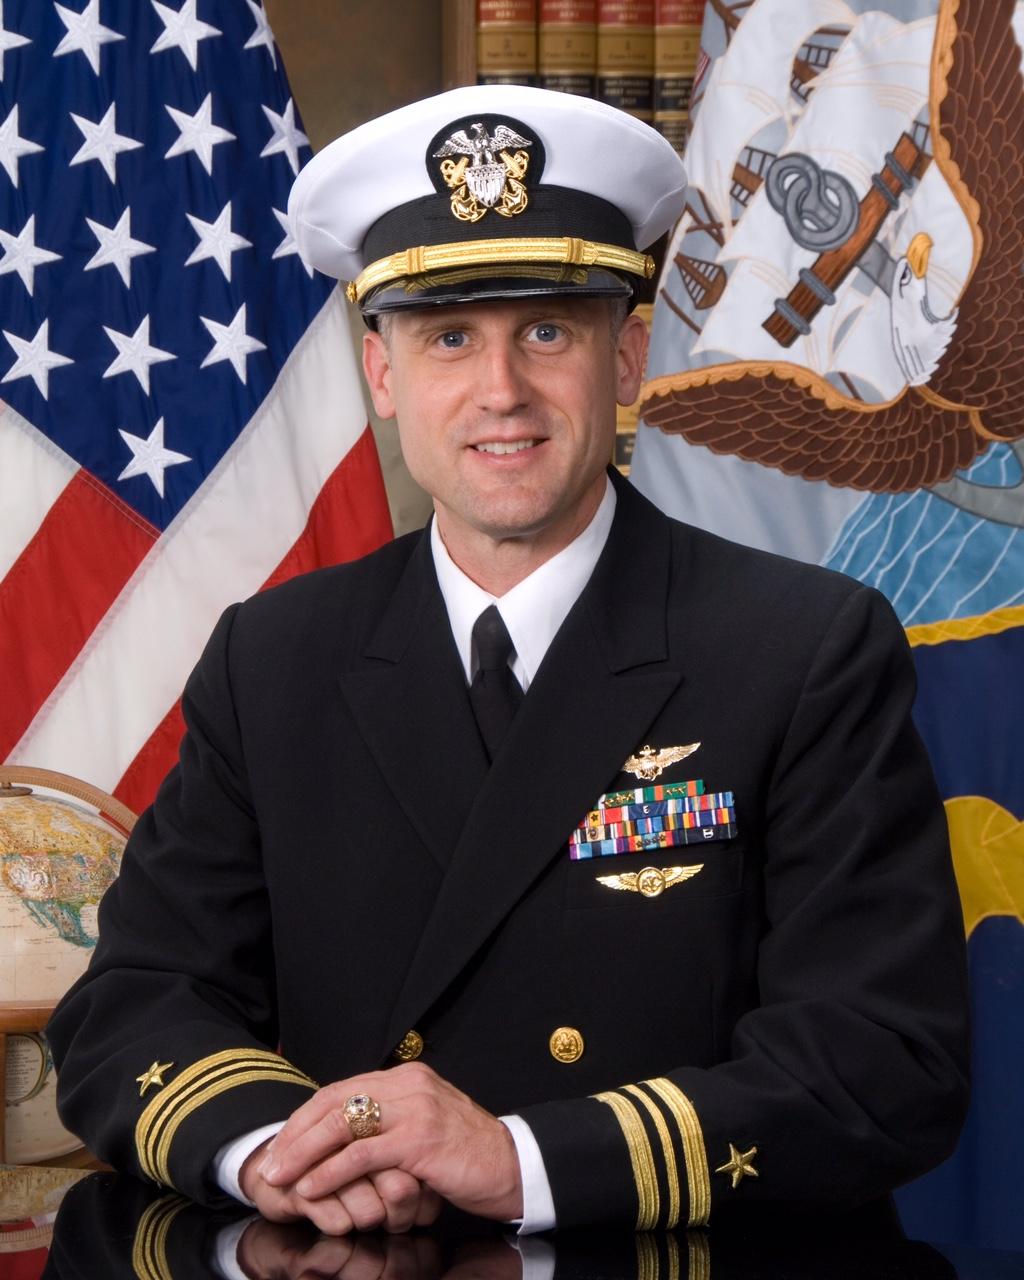 Scott_Commander_Photo.jpg